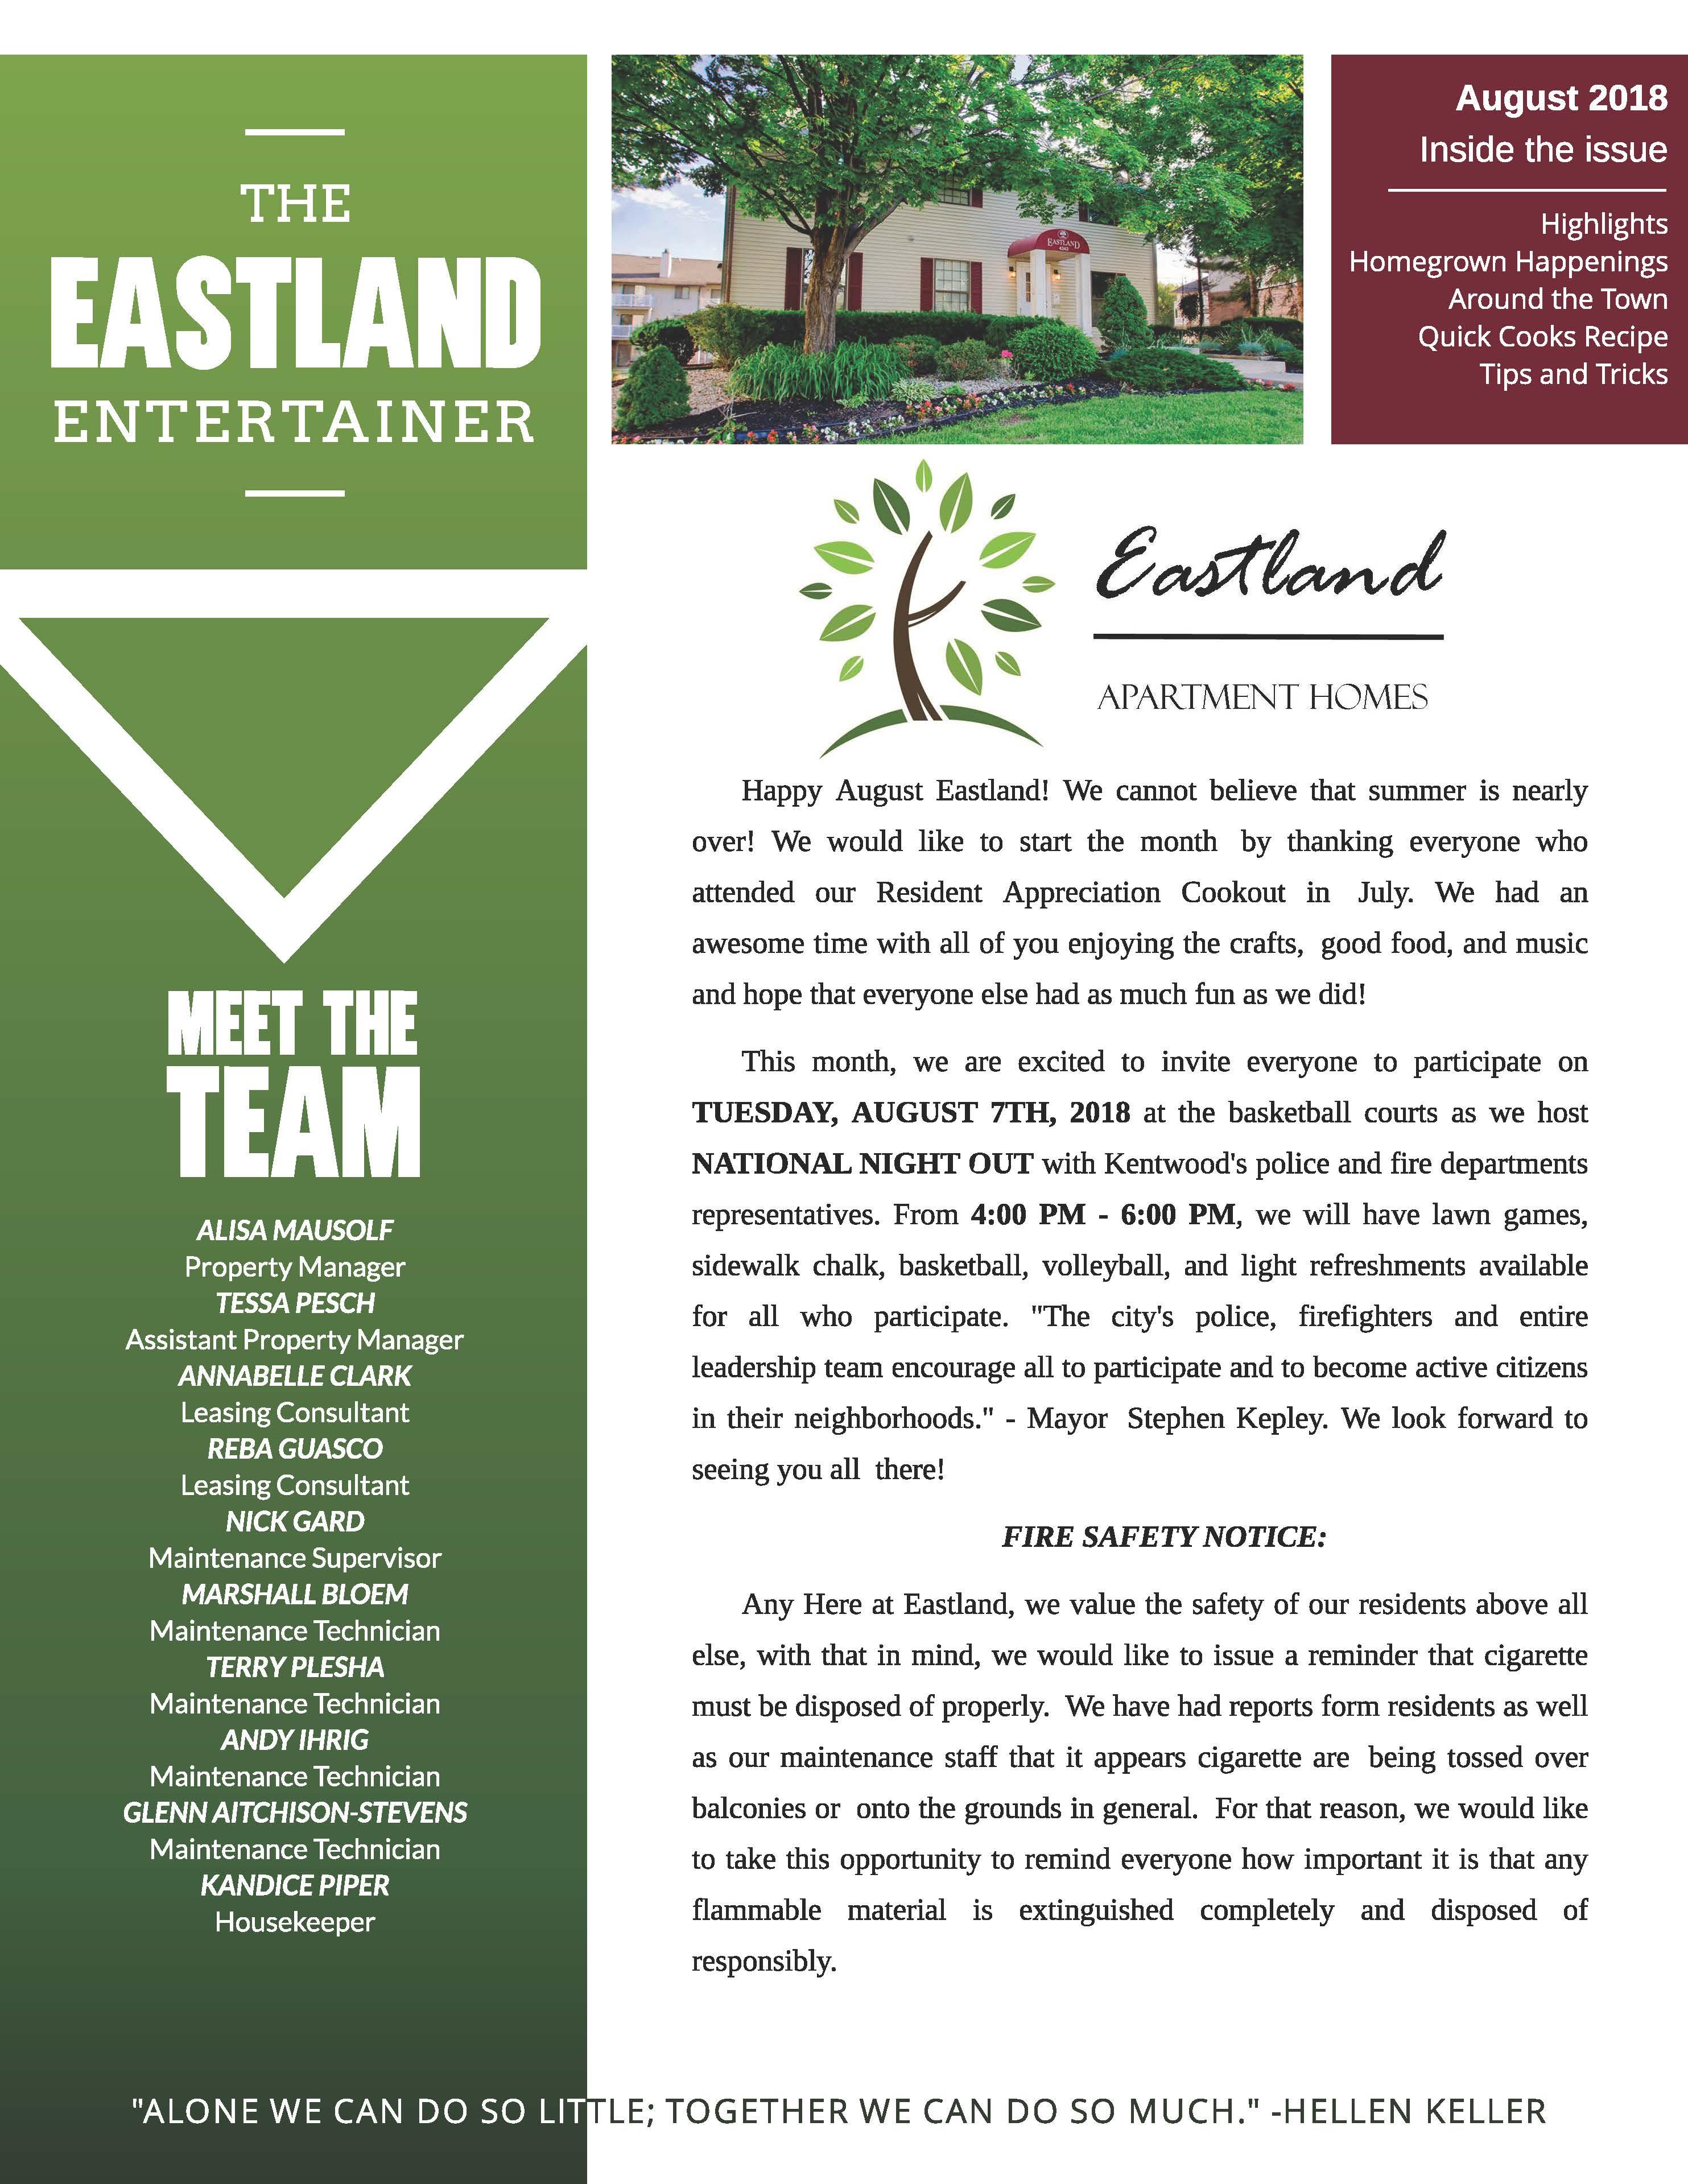 The Eastland Apartments Community